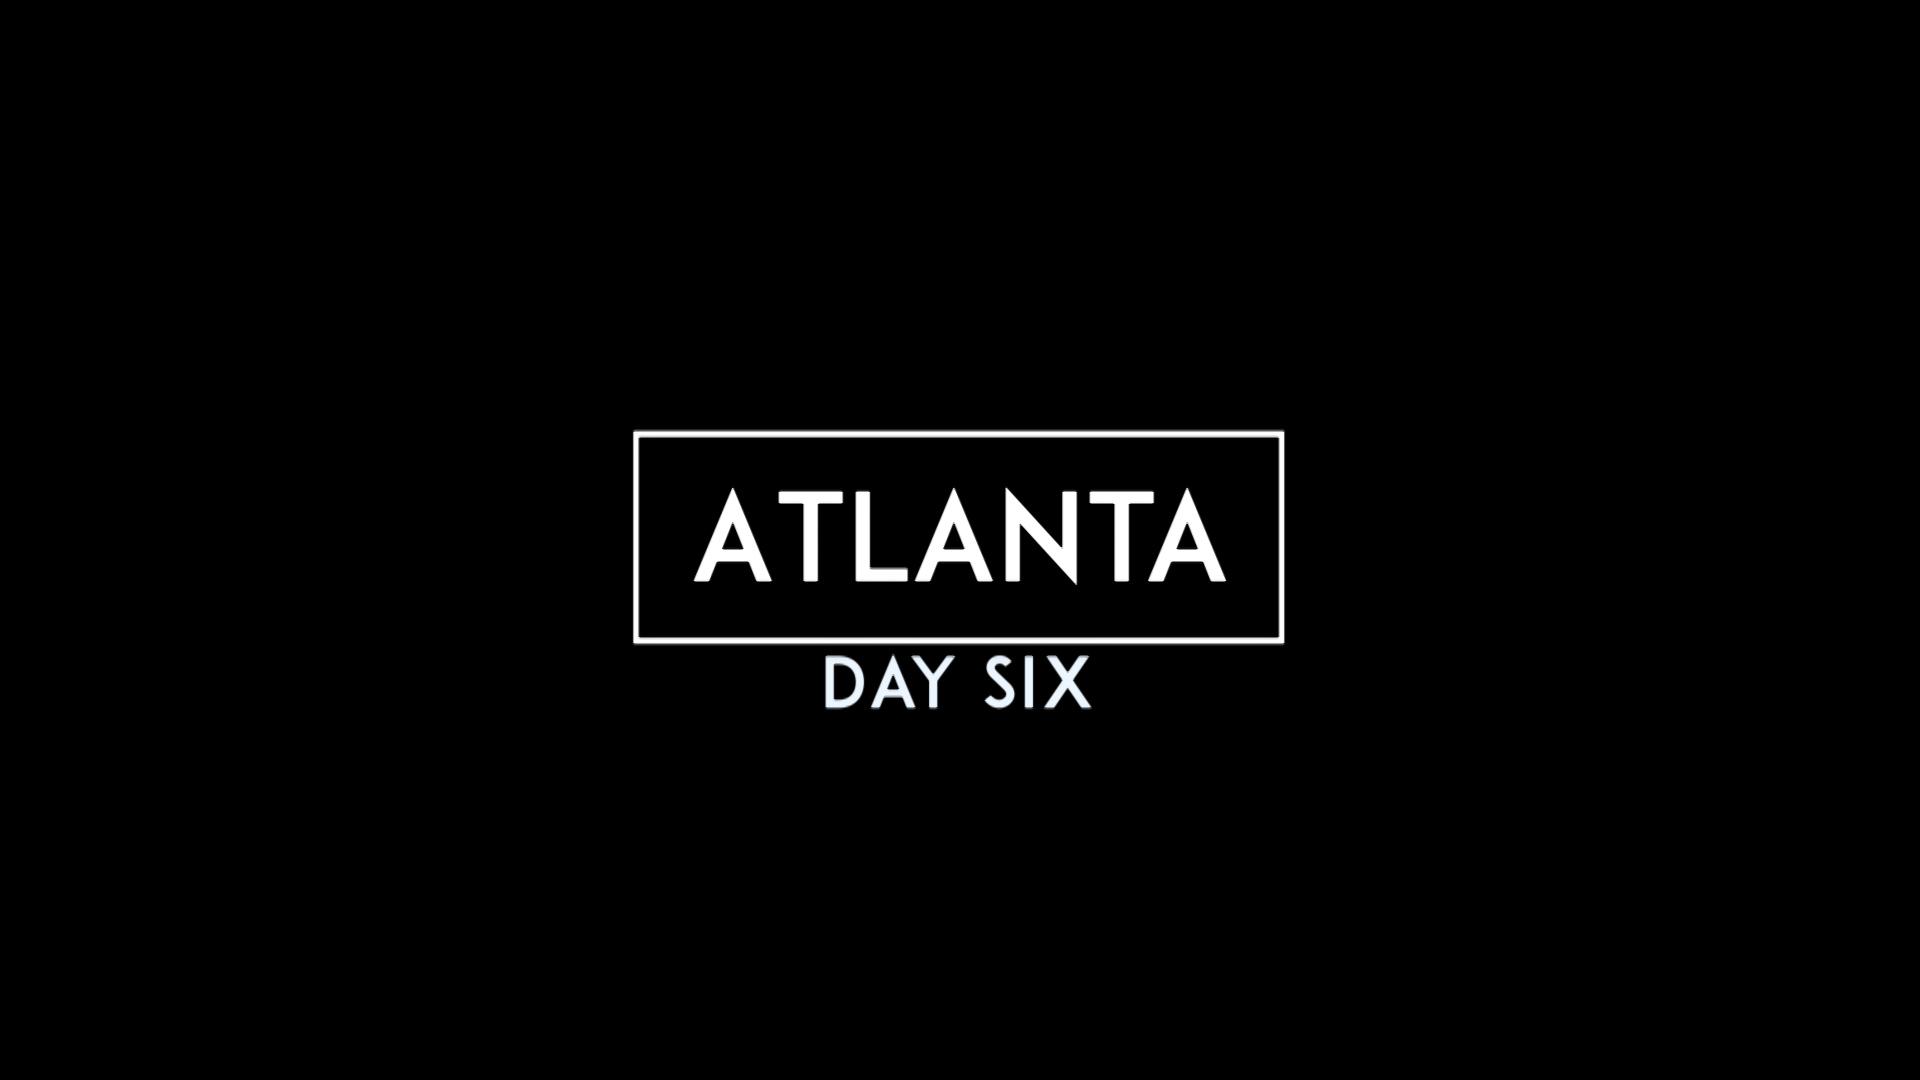 Atlanta Day Six.jpg